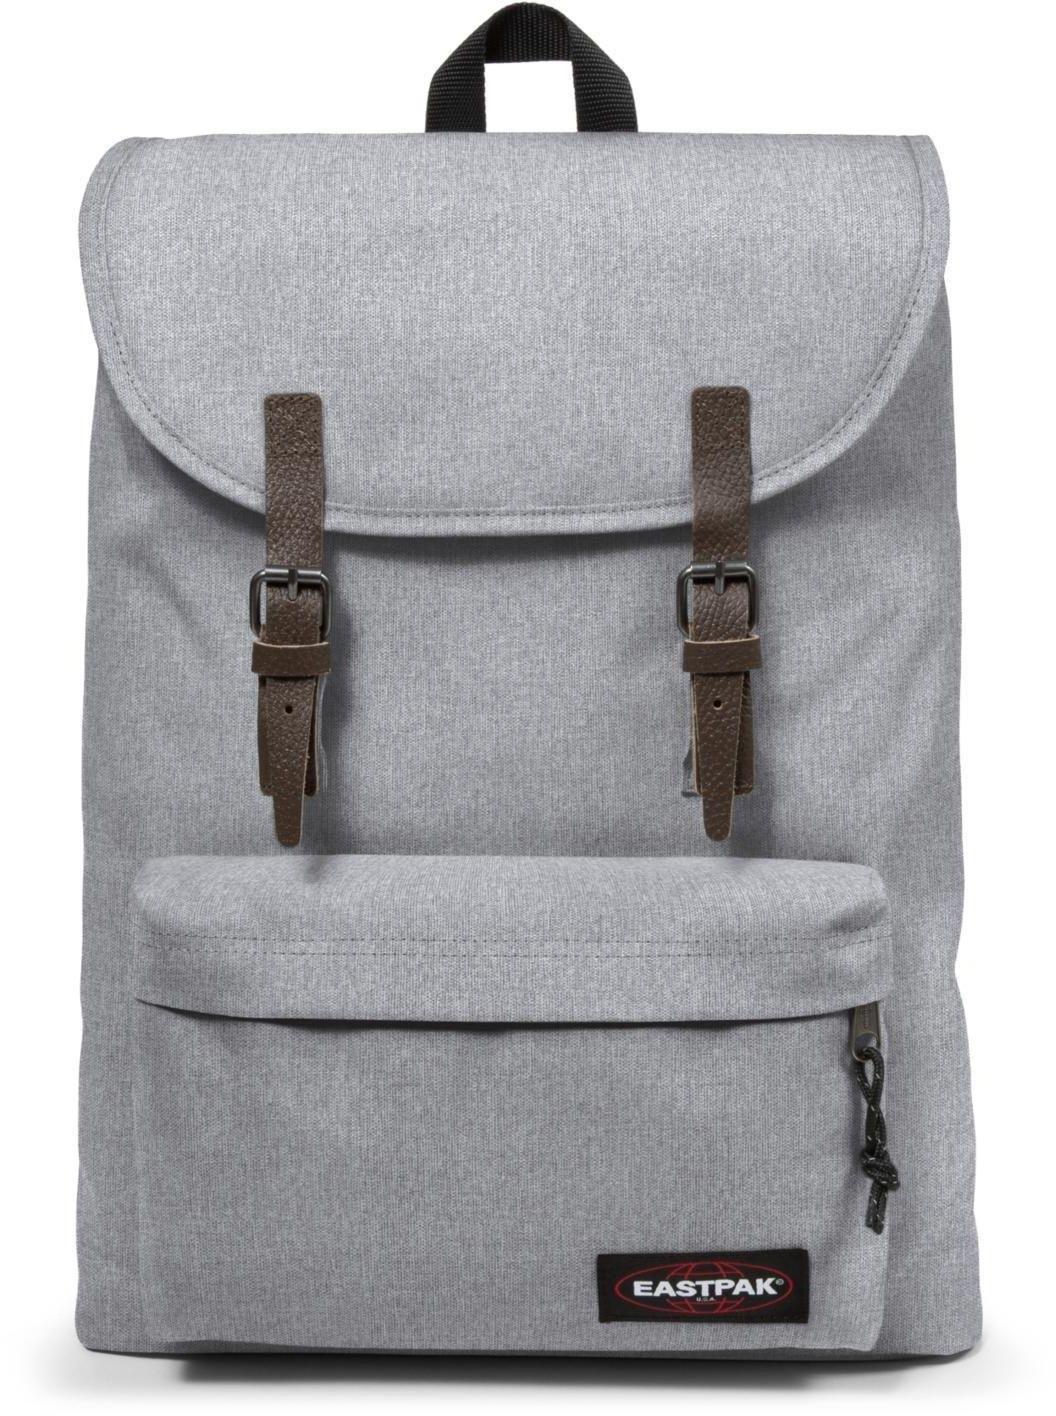 Eastpak rugzak met laptopvak, »LONDON sunday grey« nu online kopen bij OTTO